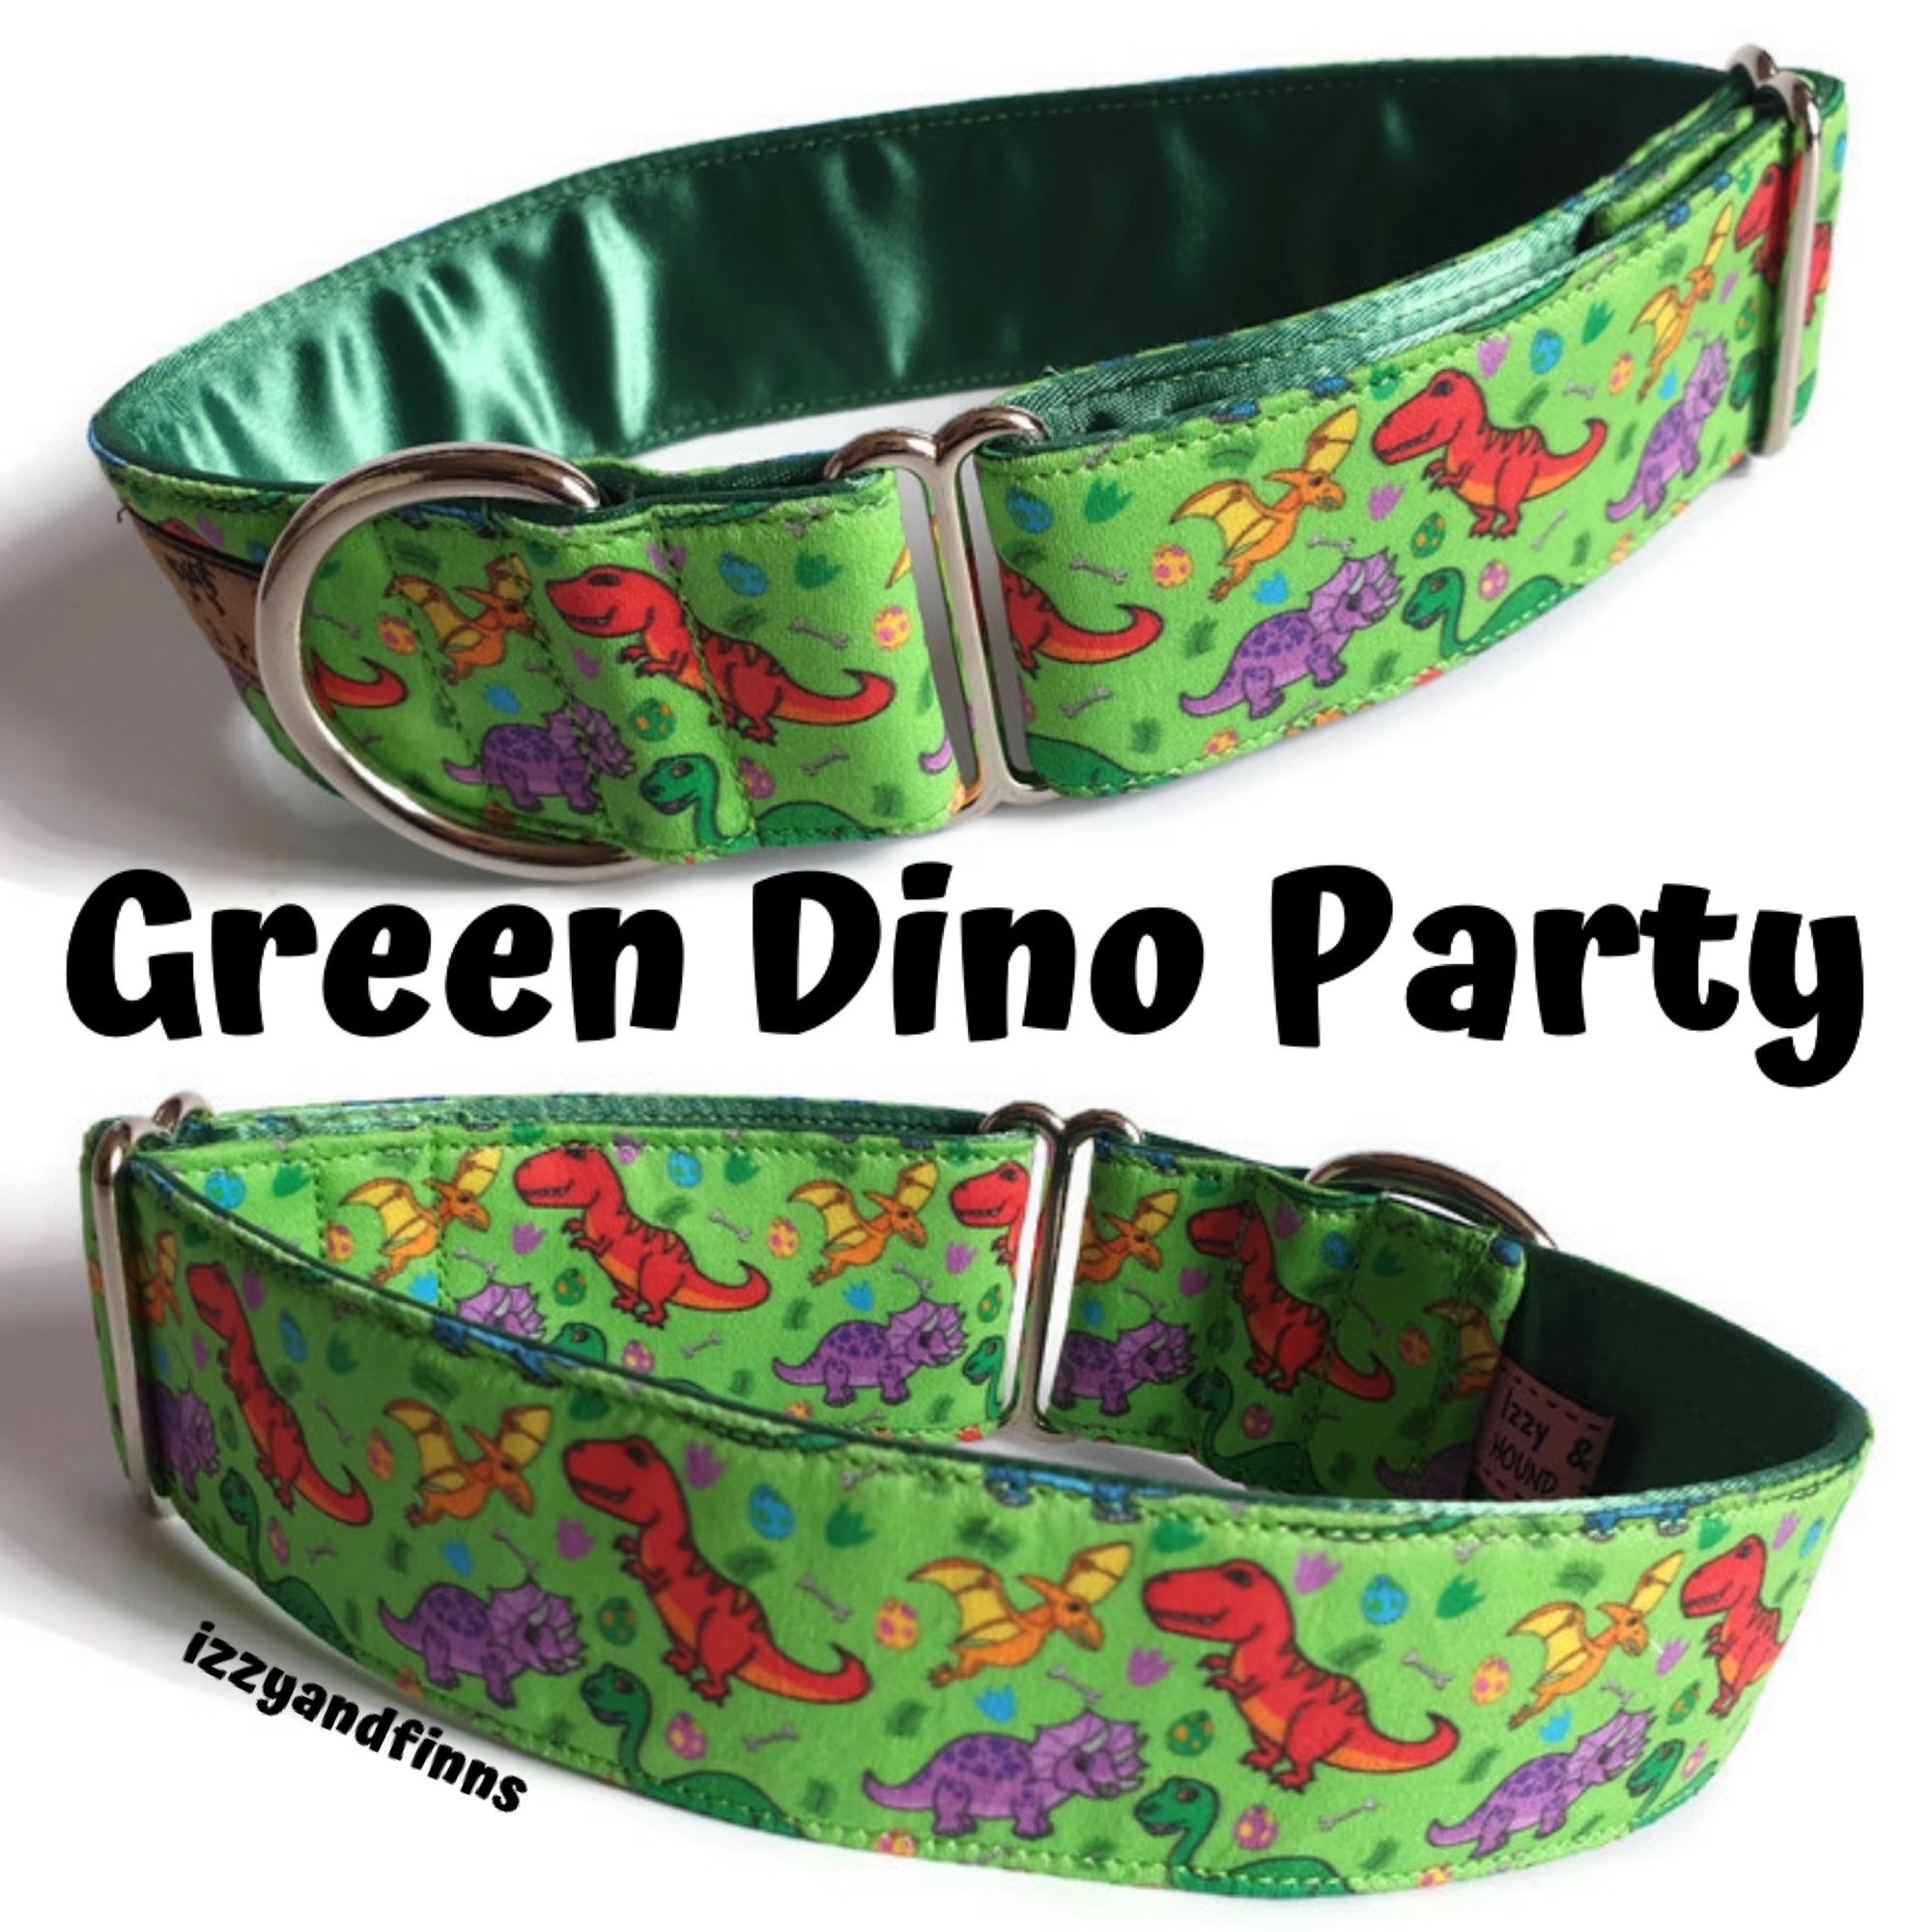 Green Dino Party